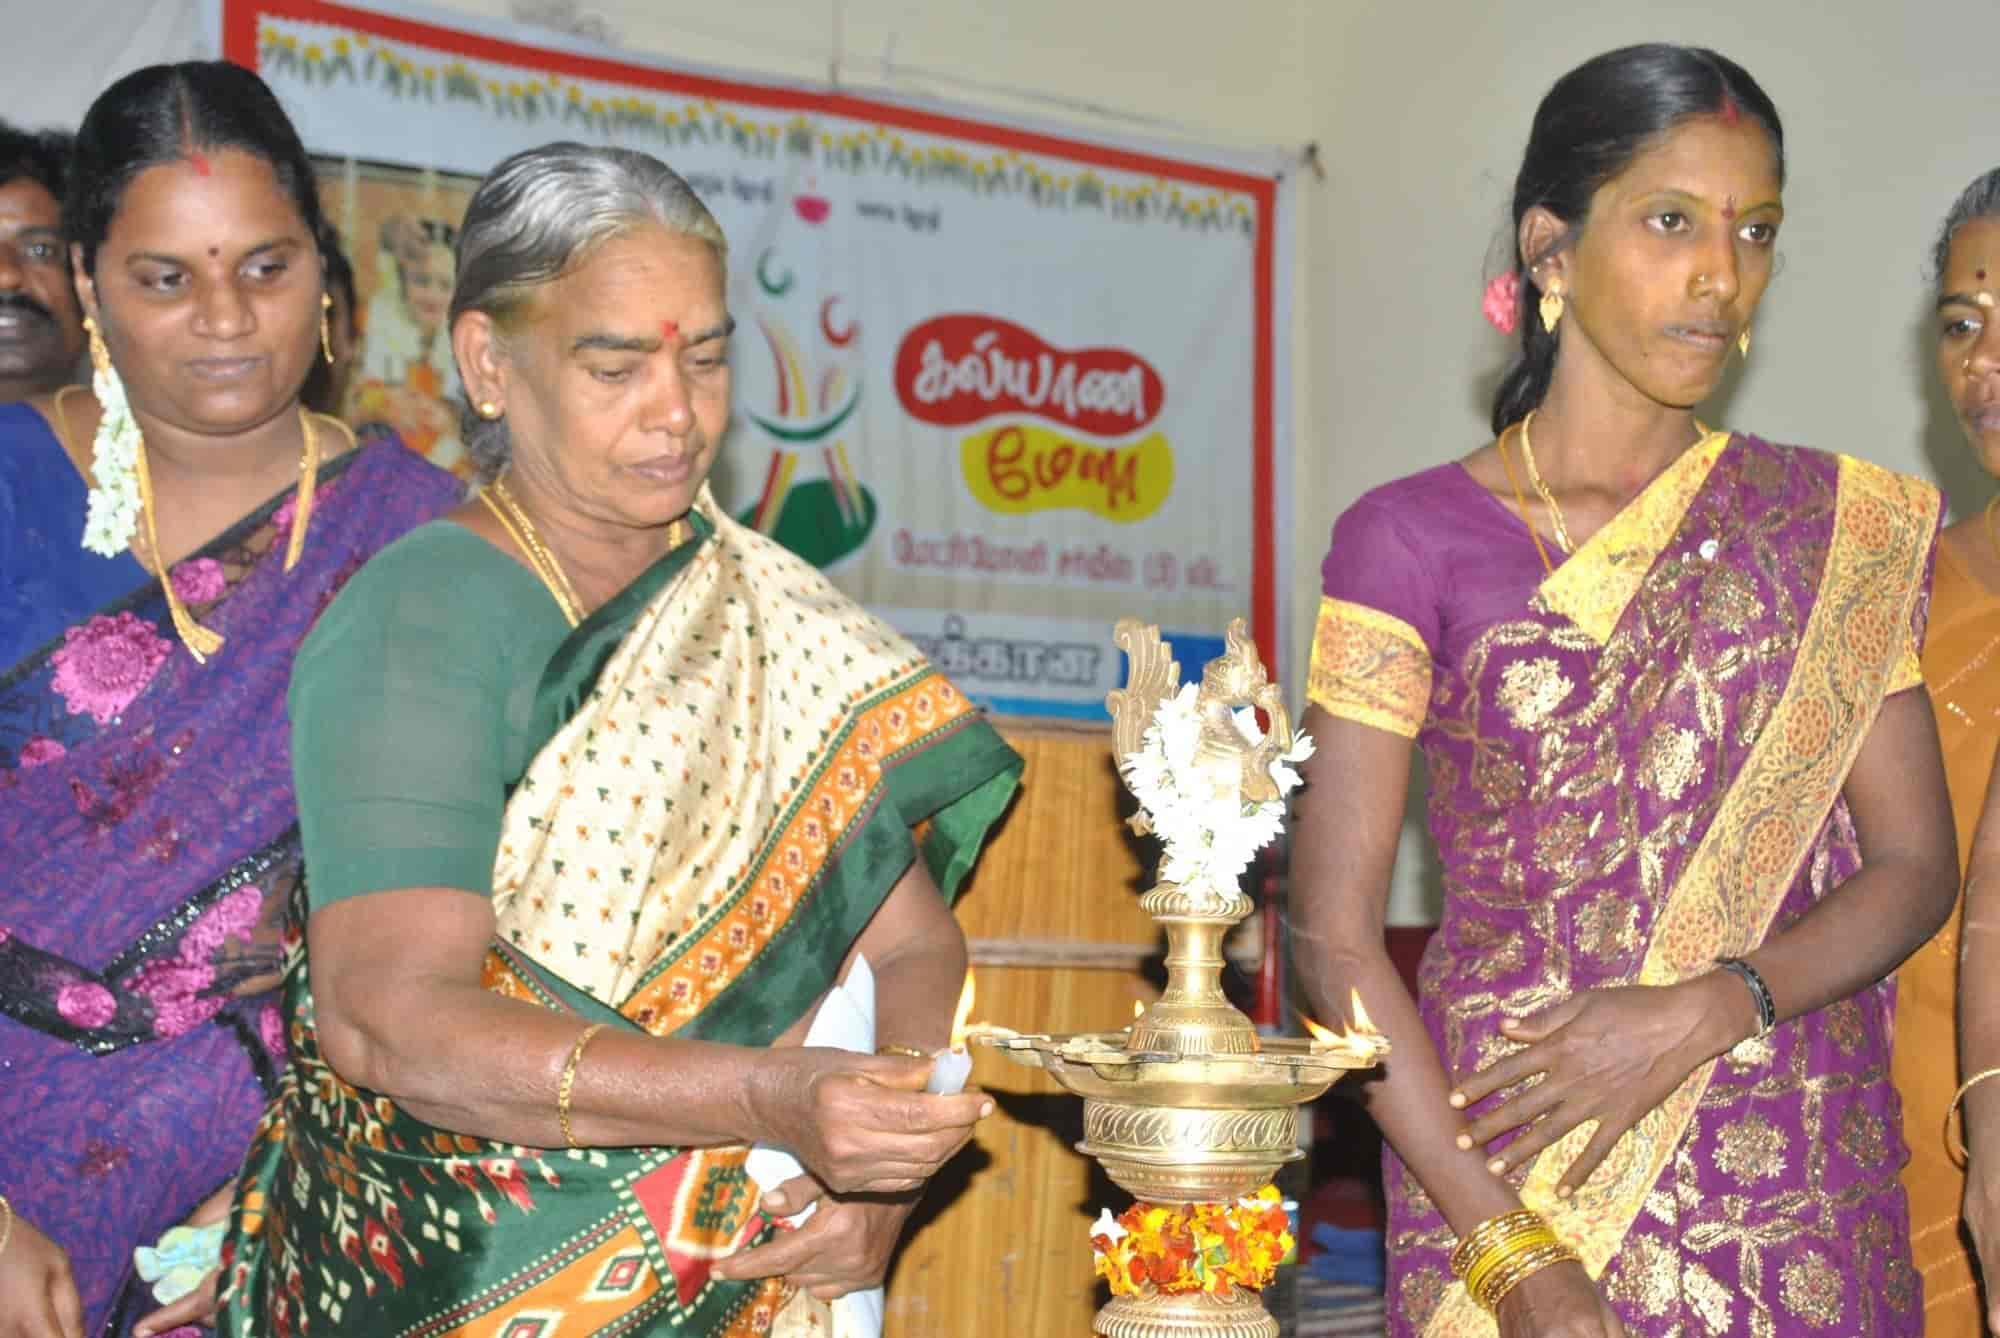 Kalyana Mela Matrimony Services Pvt Ltd, Thillai Nagar